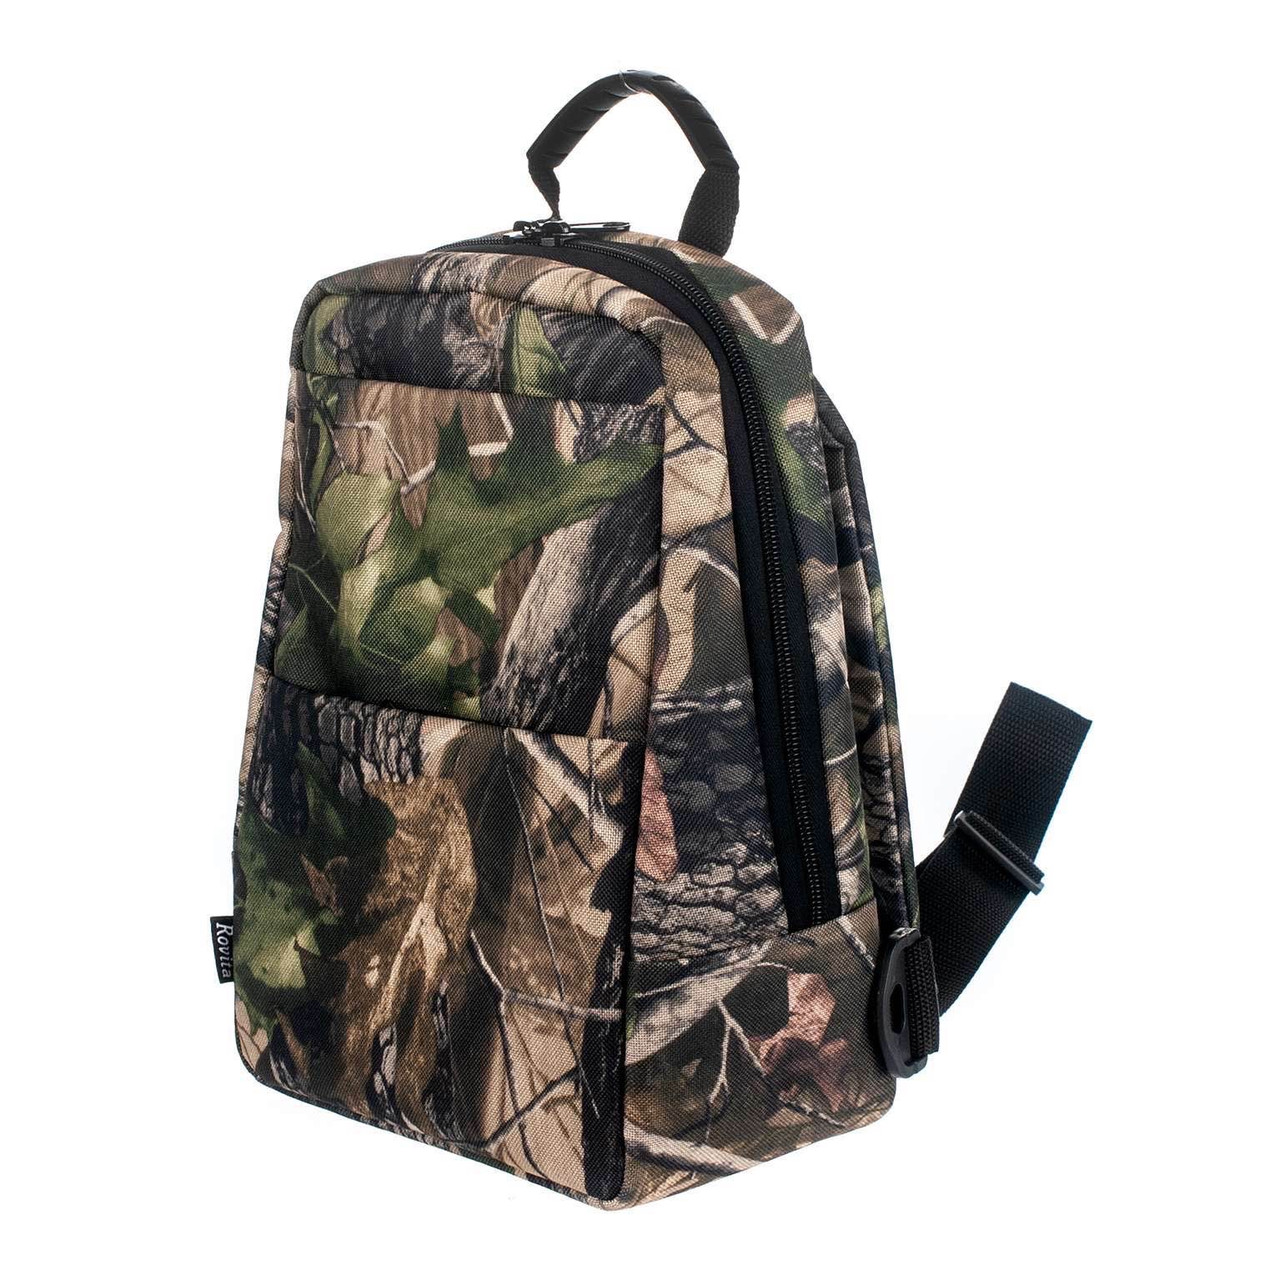 Рюкзак ROVITA OXFORD 2 кармана маленький 1 лямка лес